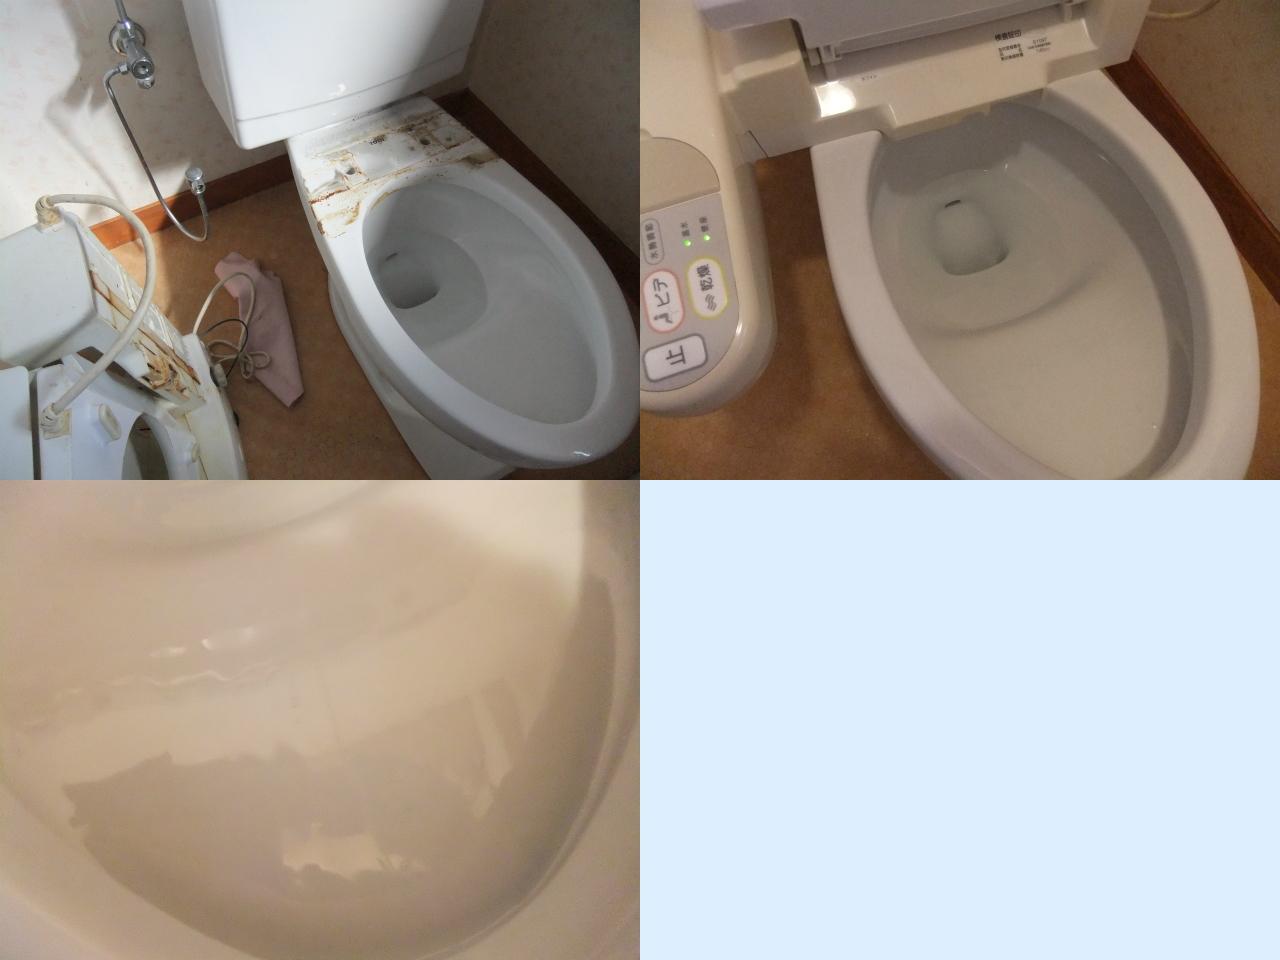 http://ajras.net/images/110909-toilet.jpg